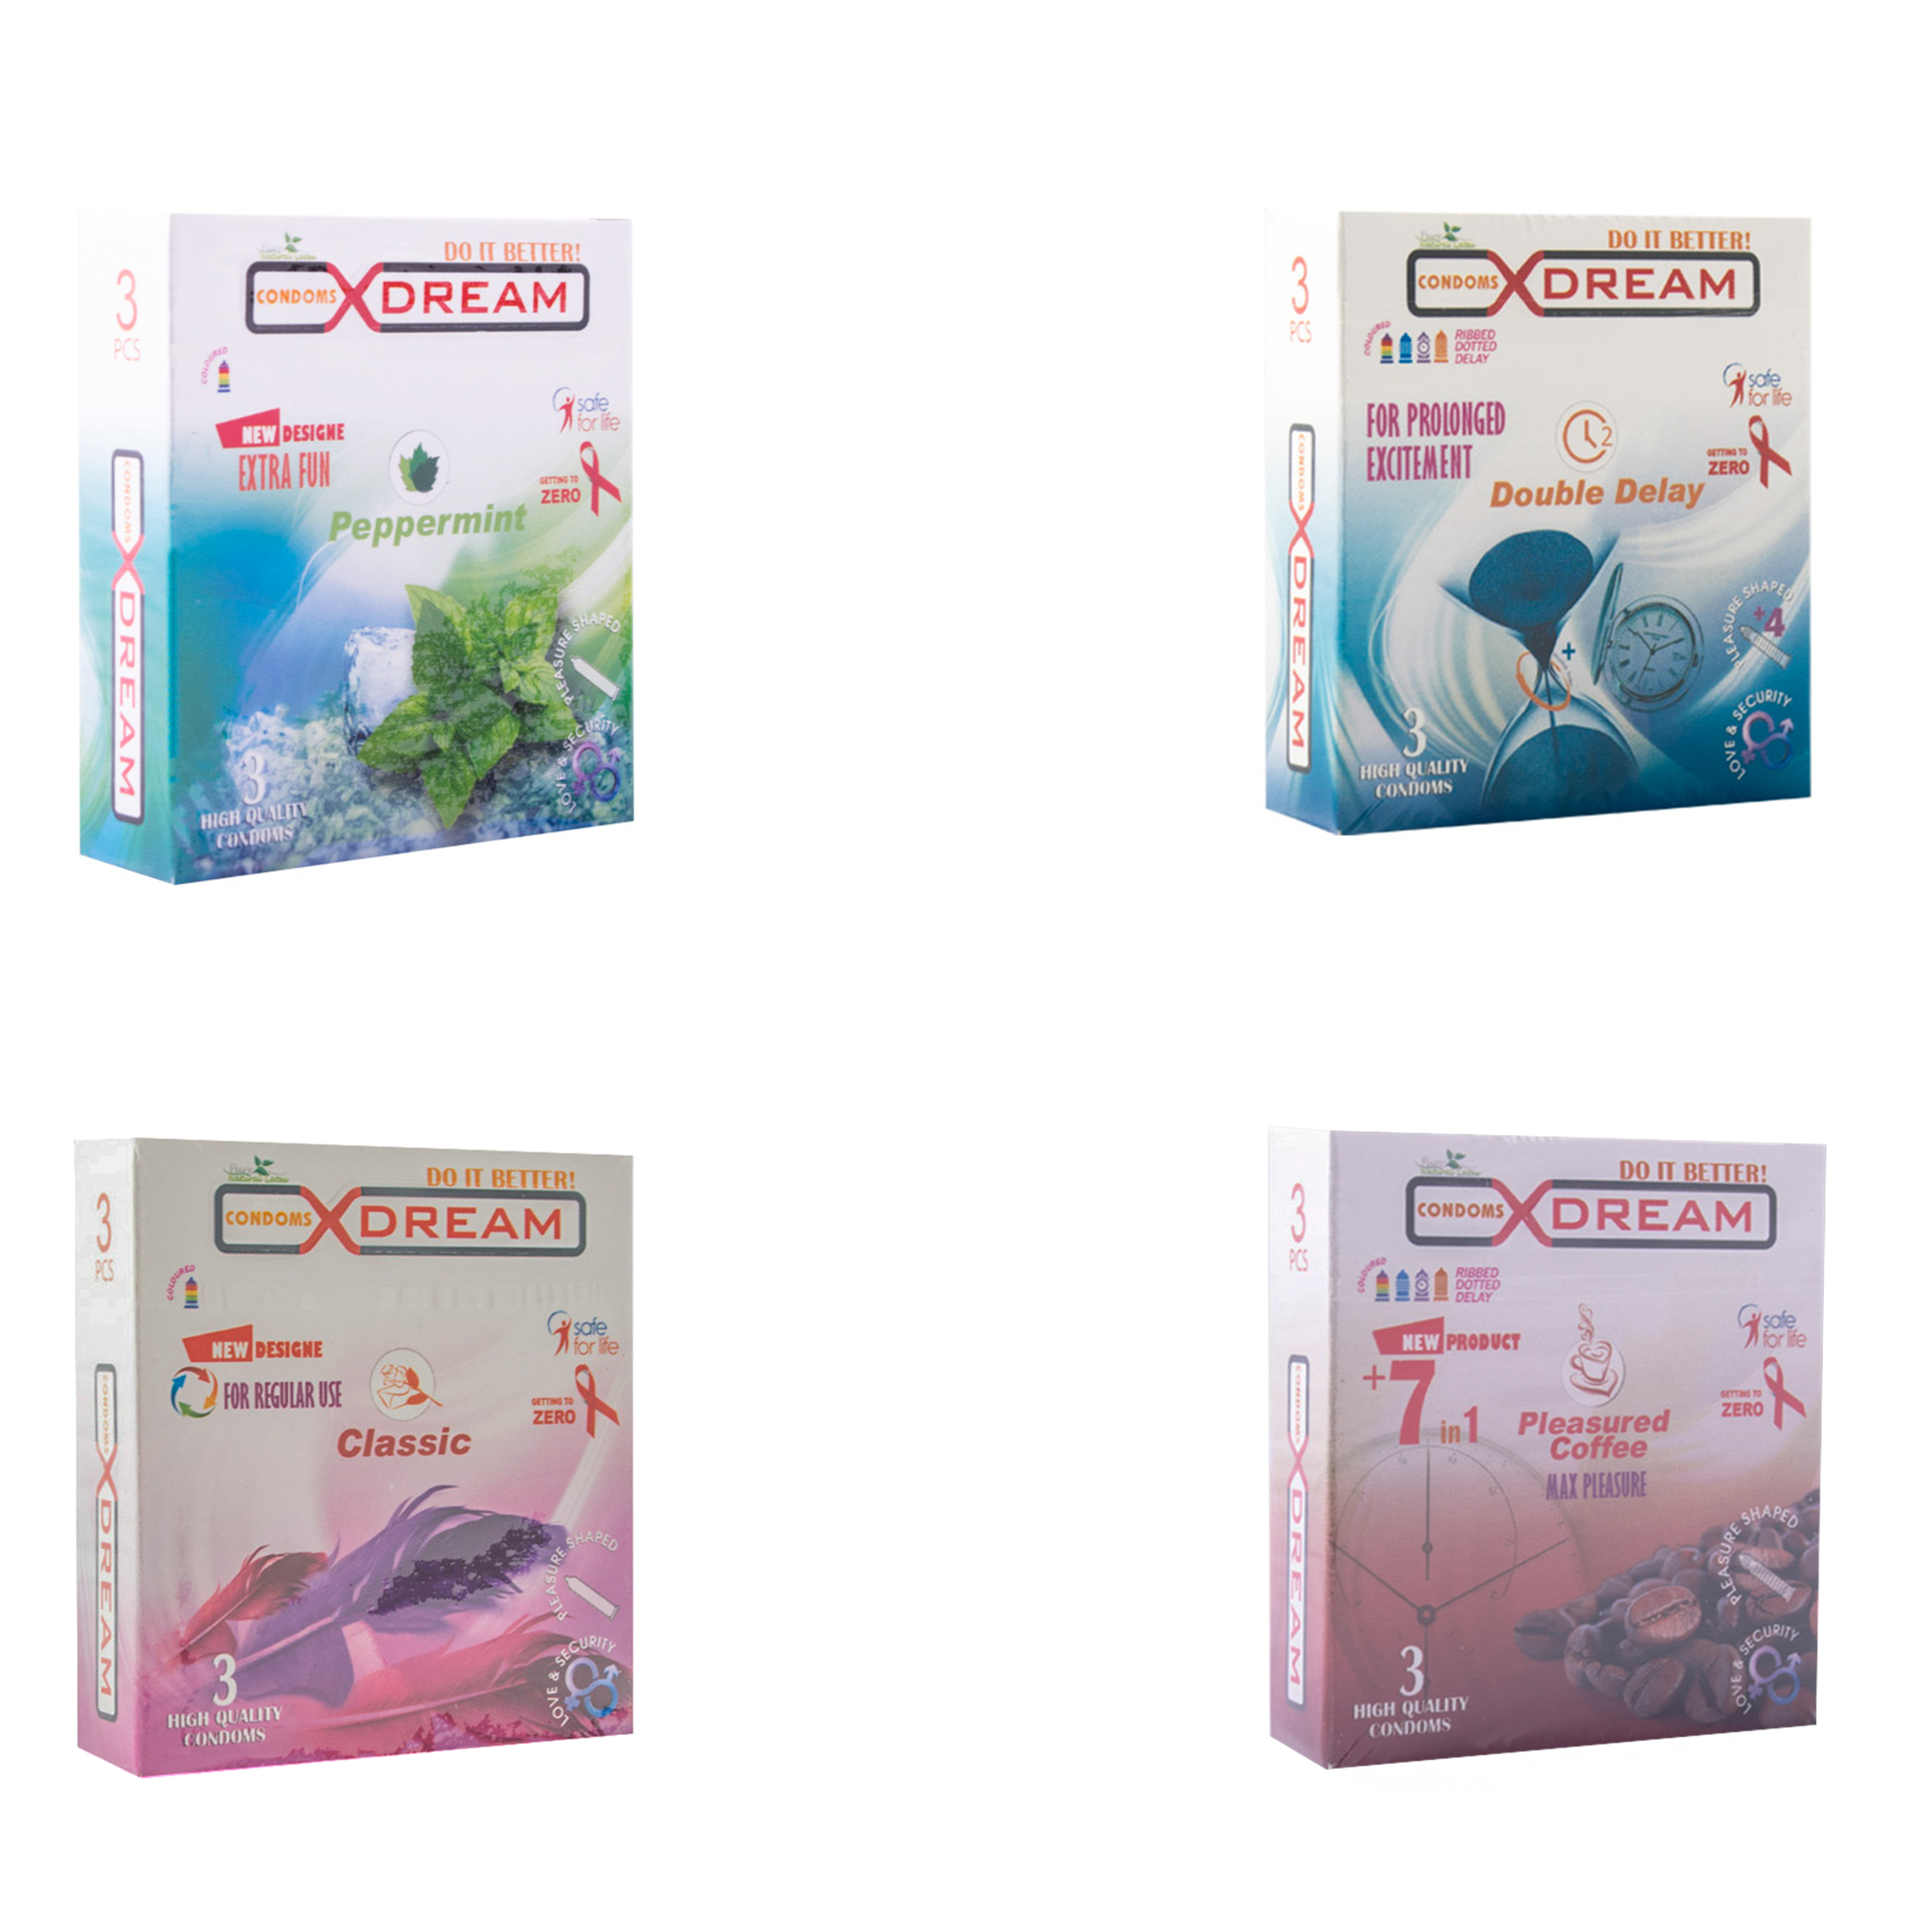 کاندوم ایکس دریم مدل 384001 مجموعه 4 عددی